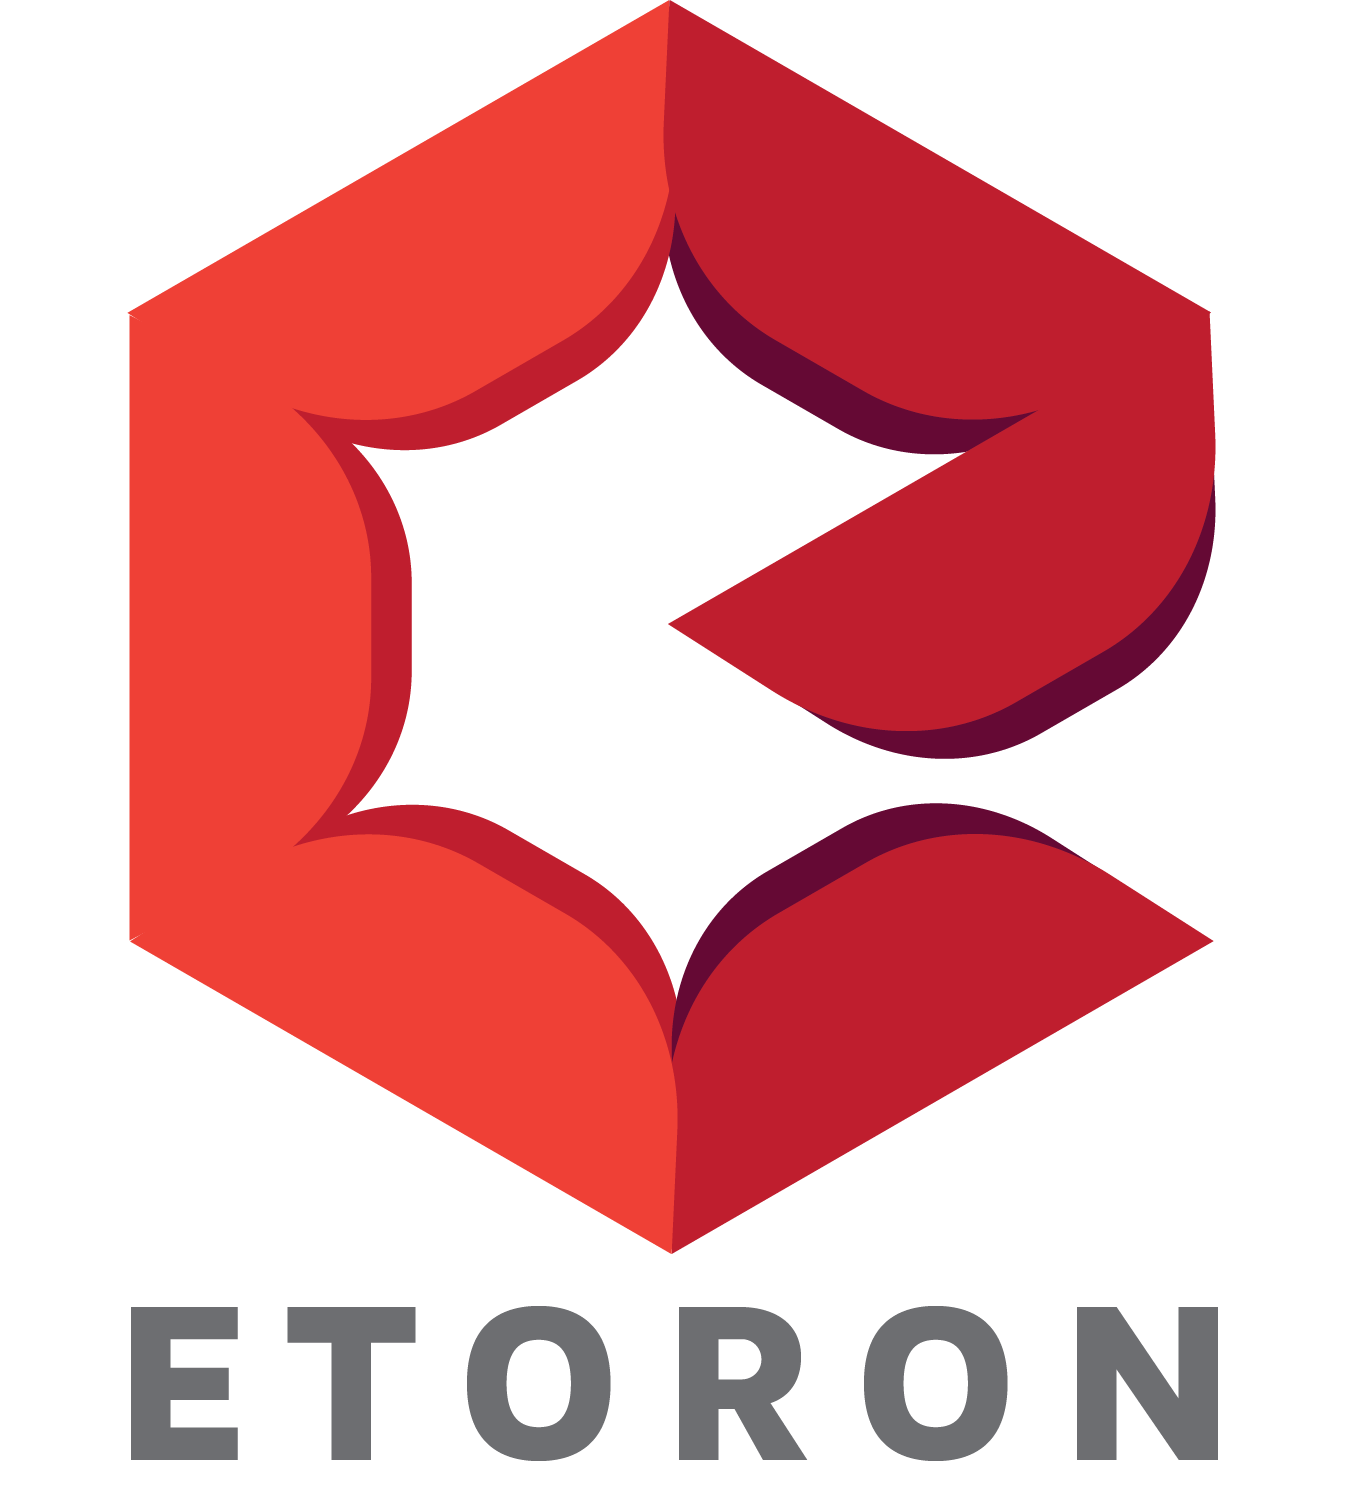 etoron-logo-text.png